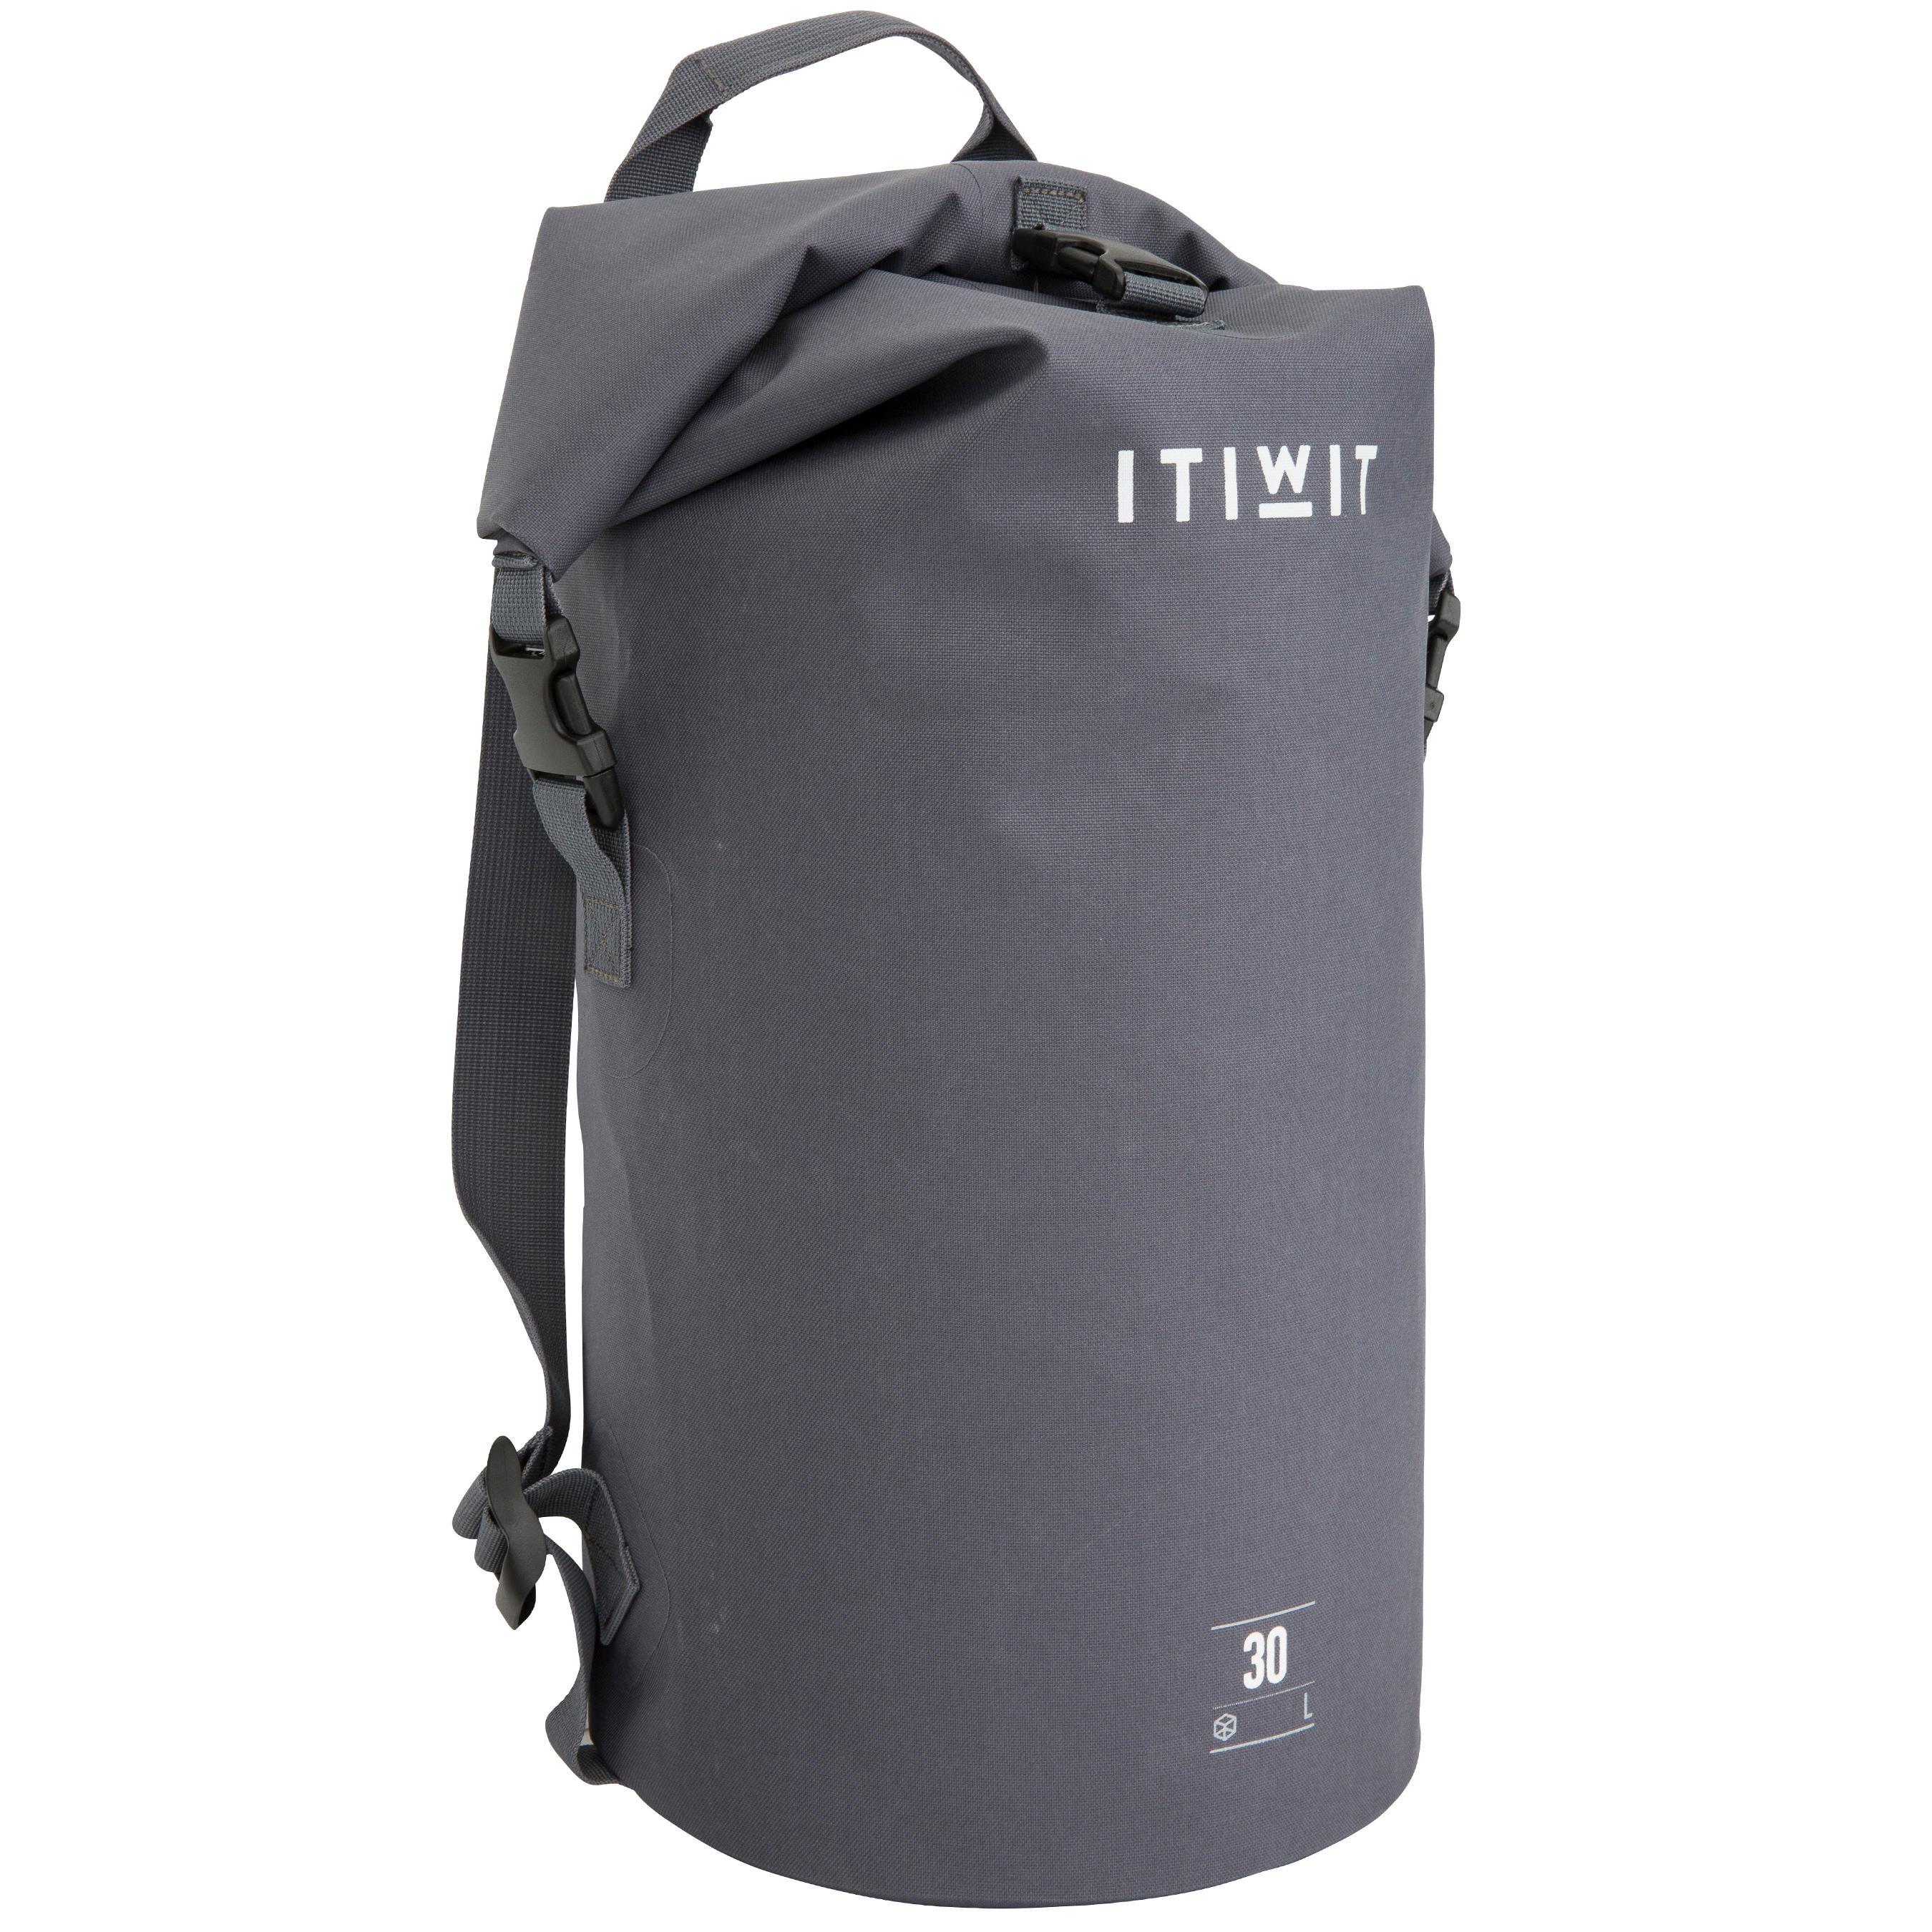 Itiwit Drybag 30 l